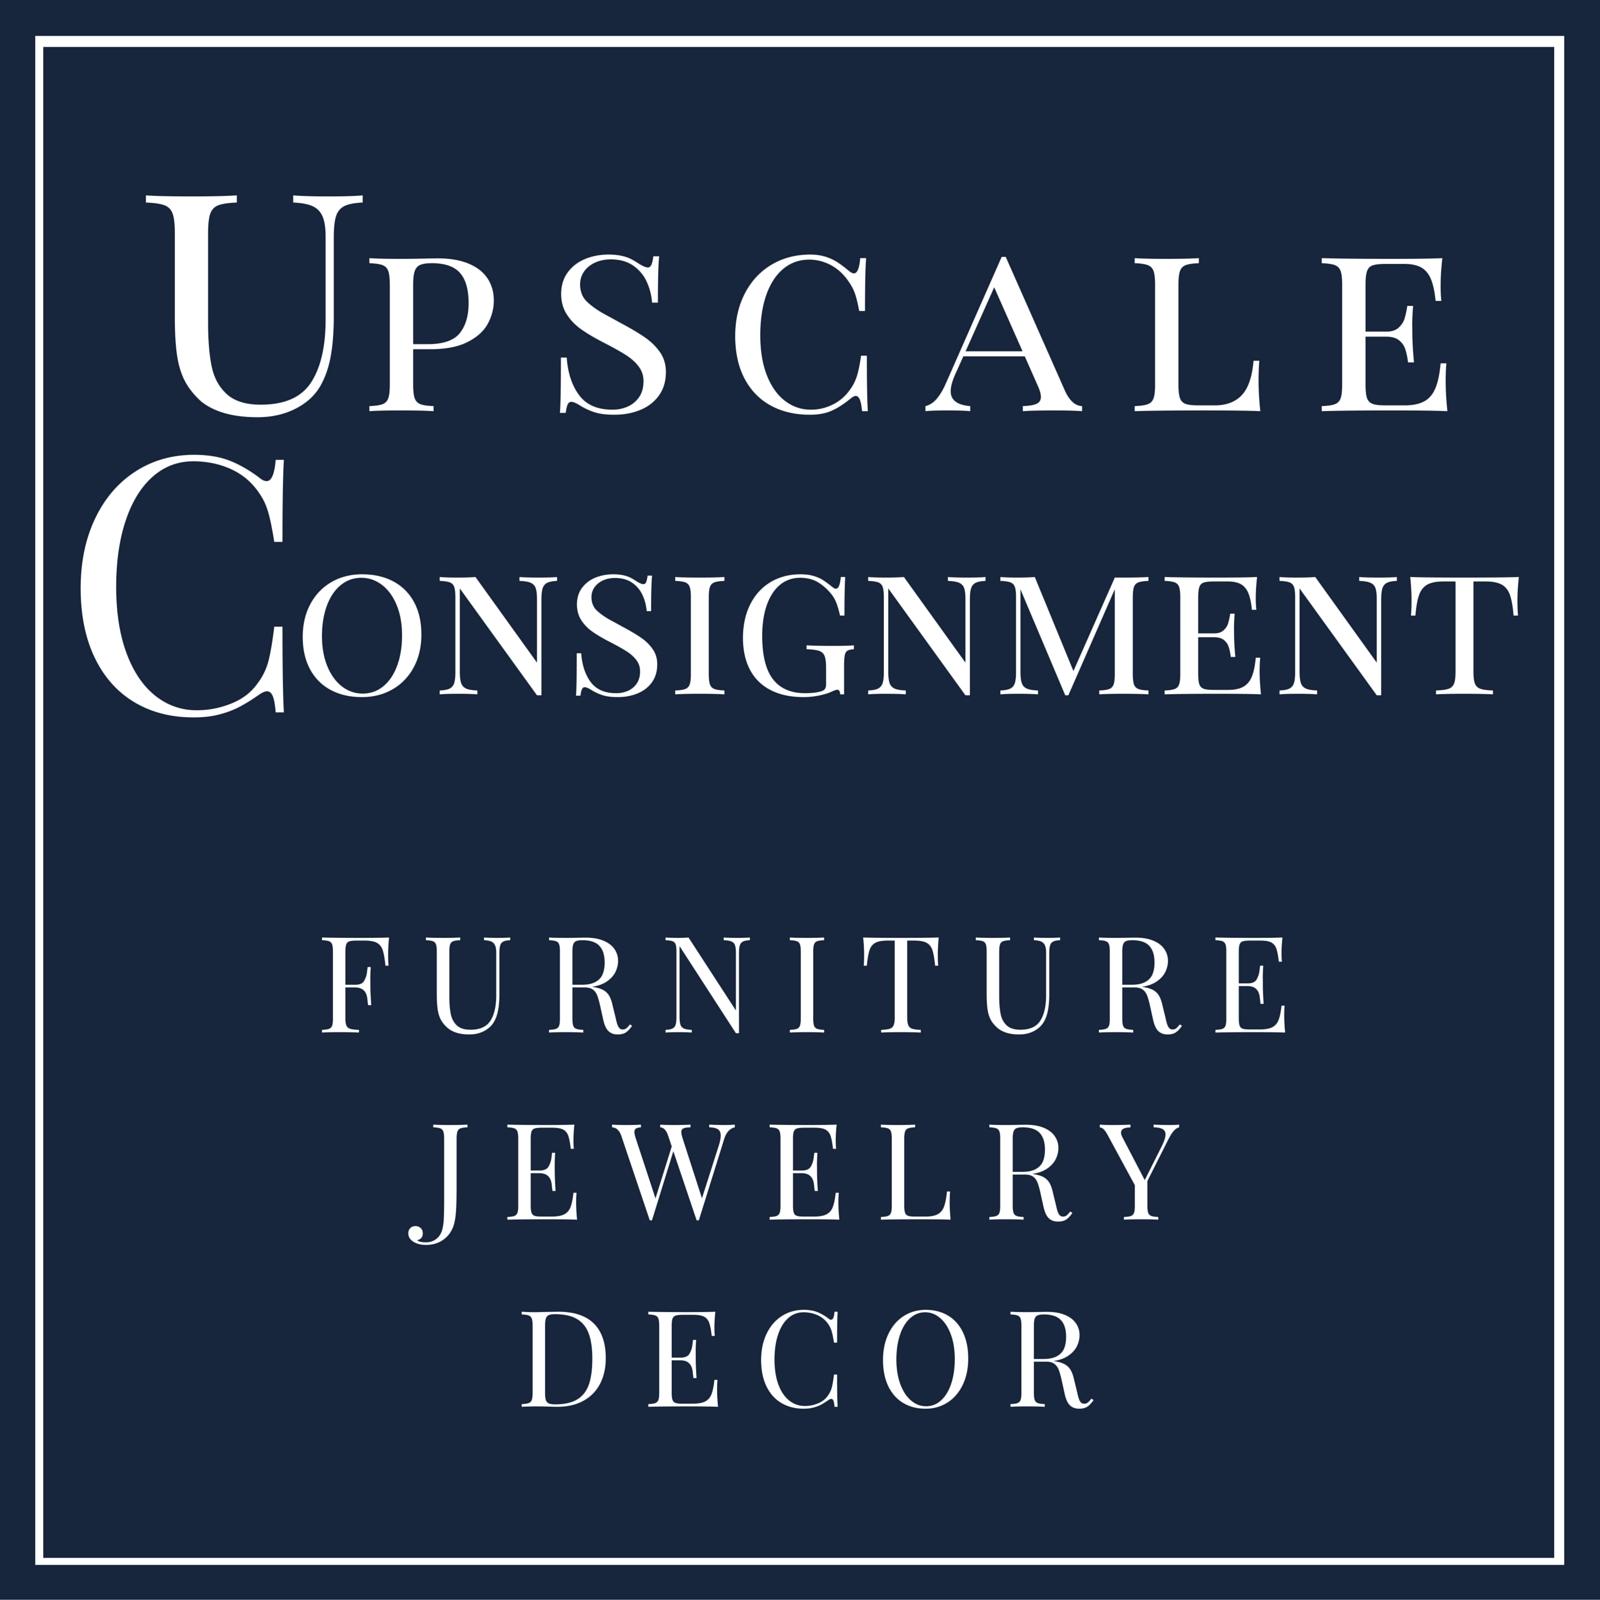 Upscale Consignment Upscale Used Furniture Decor